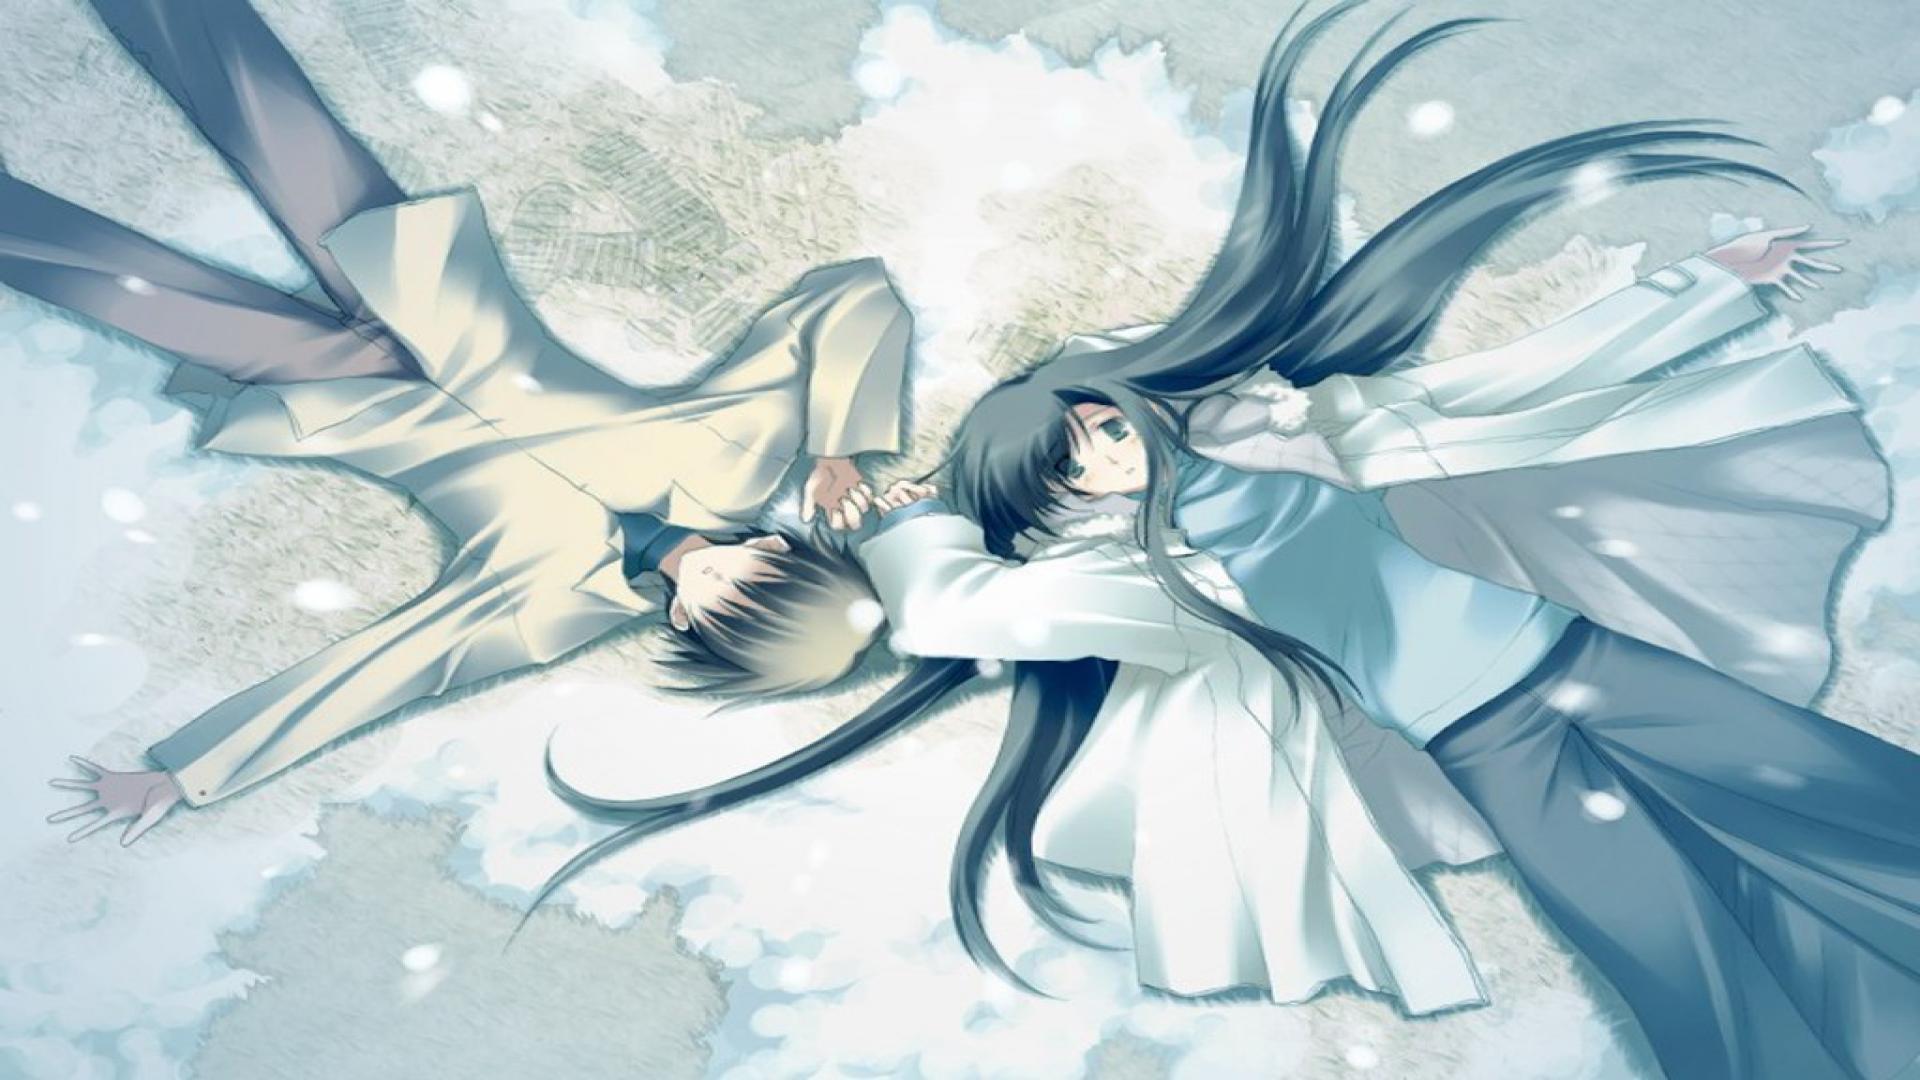 romantic anime wallpaper - photo #19